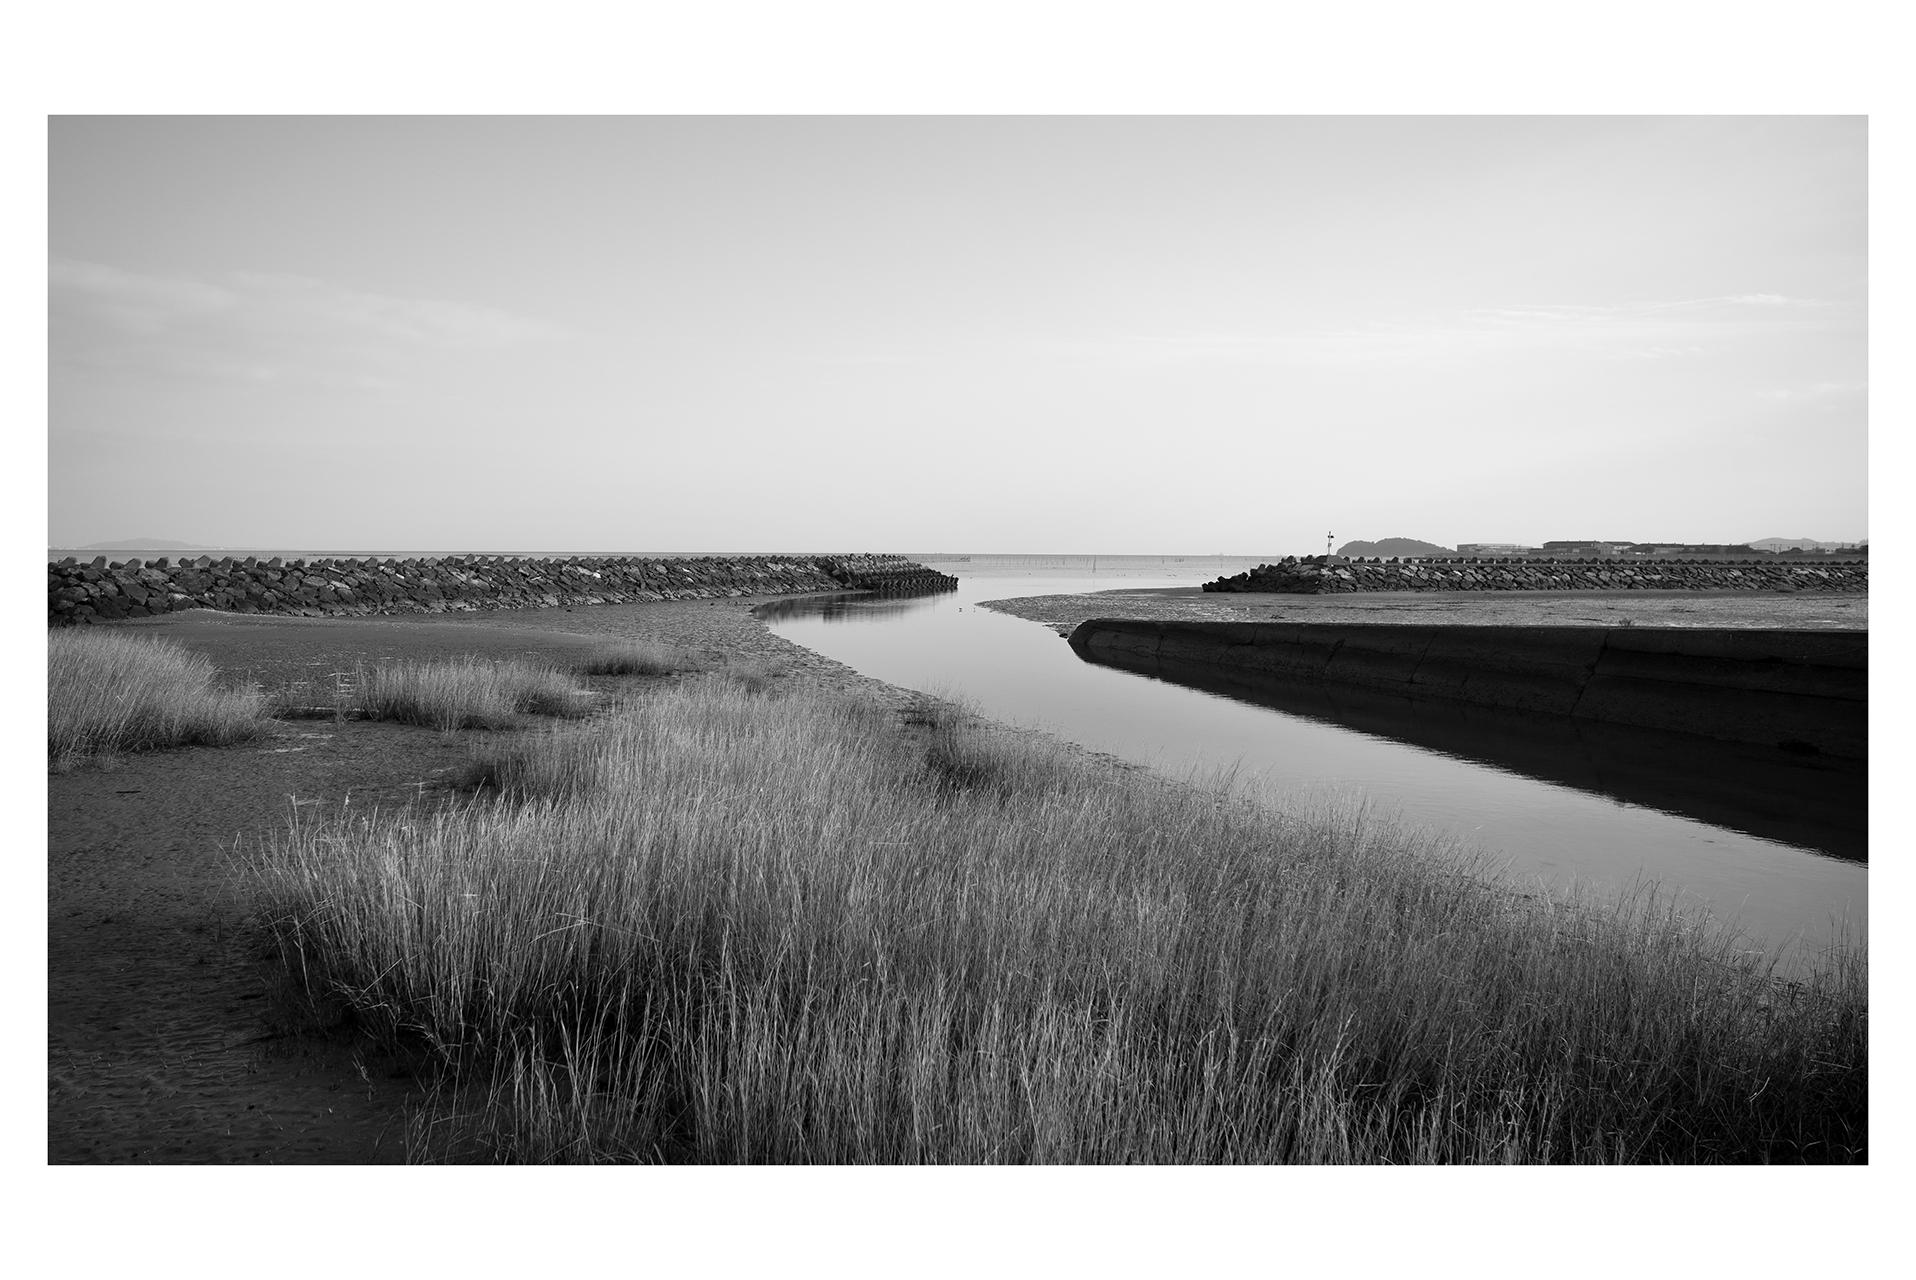 1-fb-モノクロ-ライカ-風景-干潟-L1000416-2